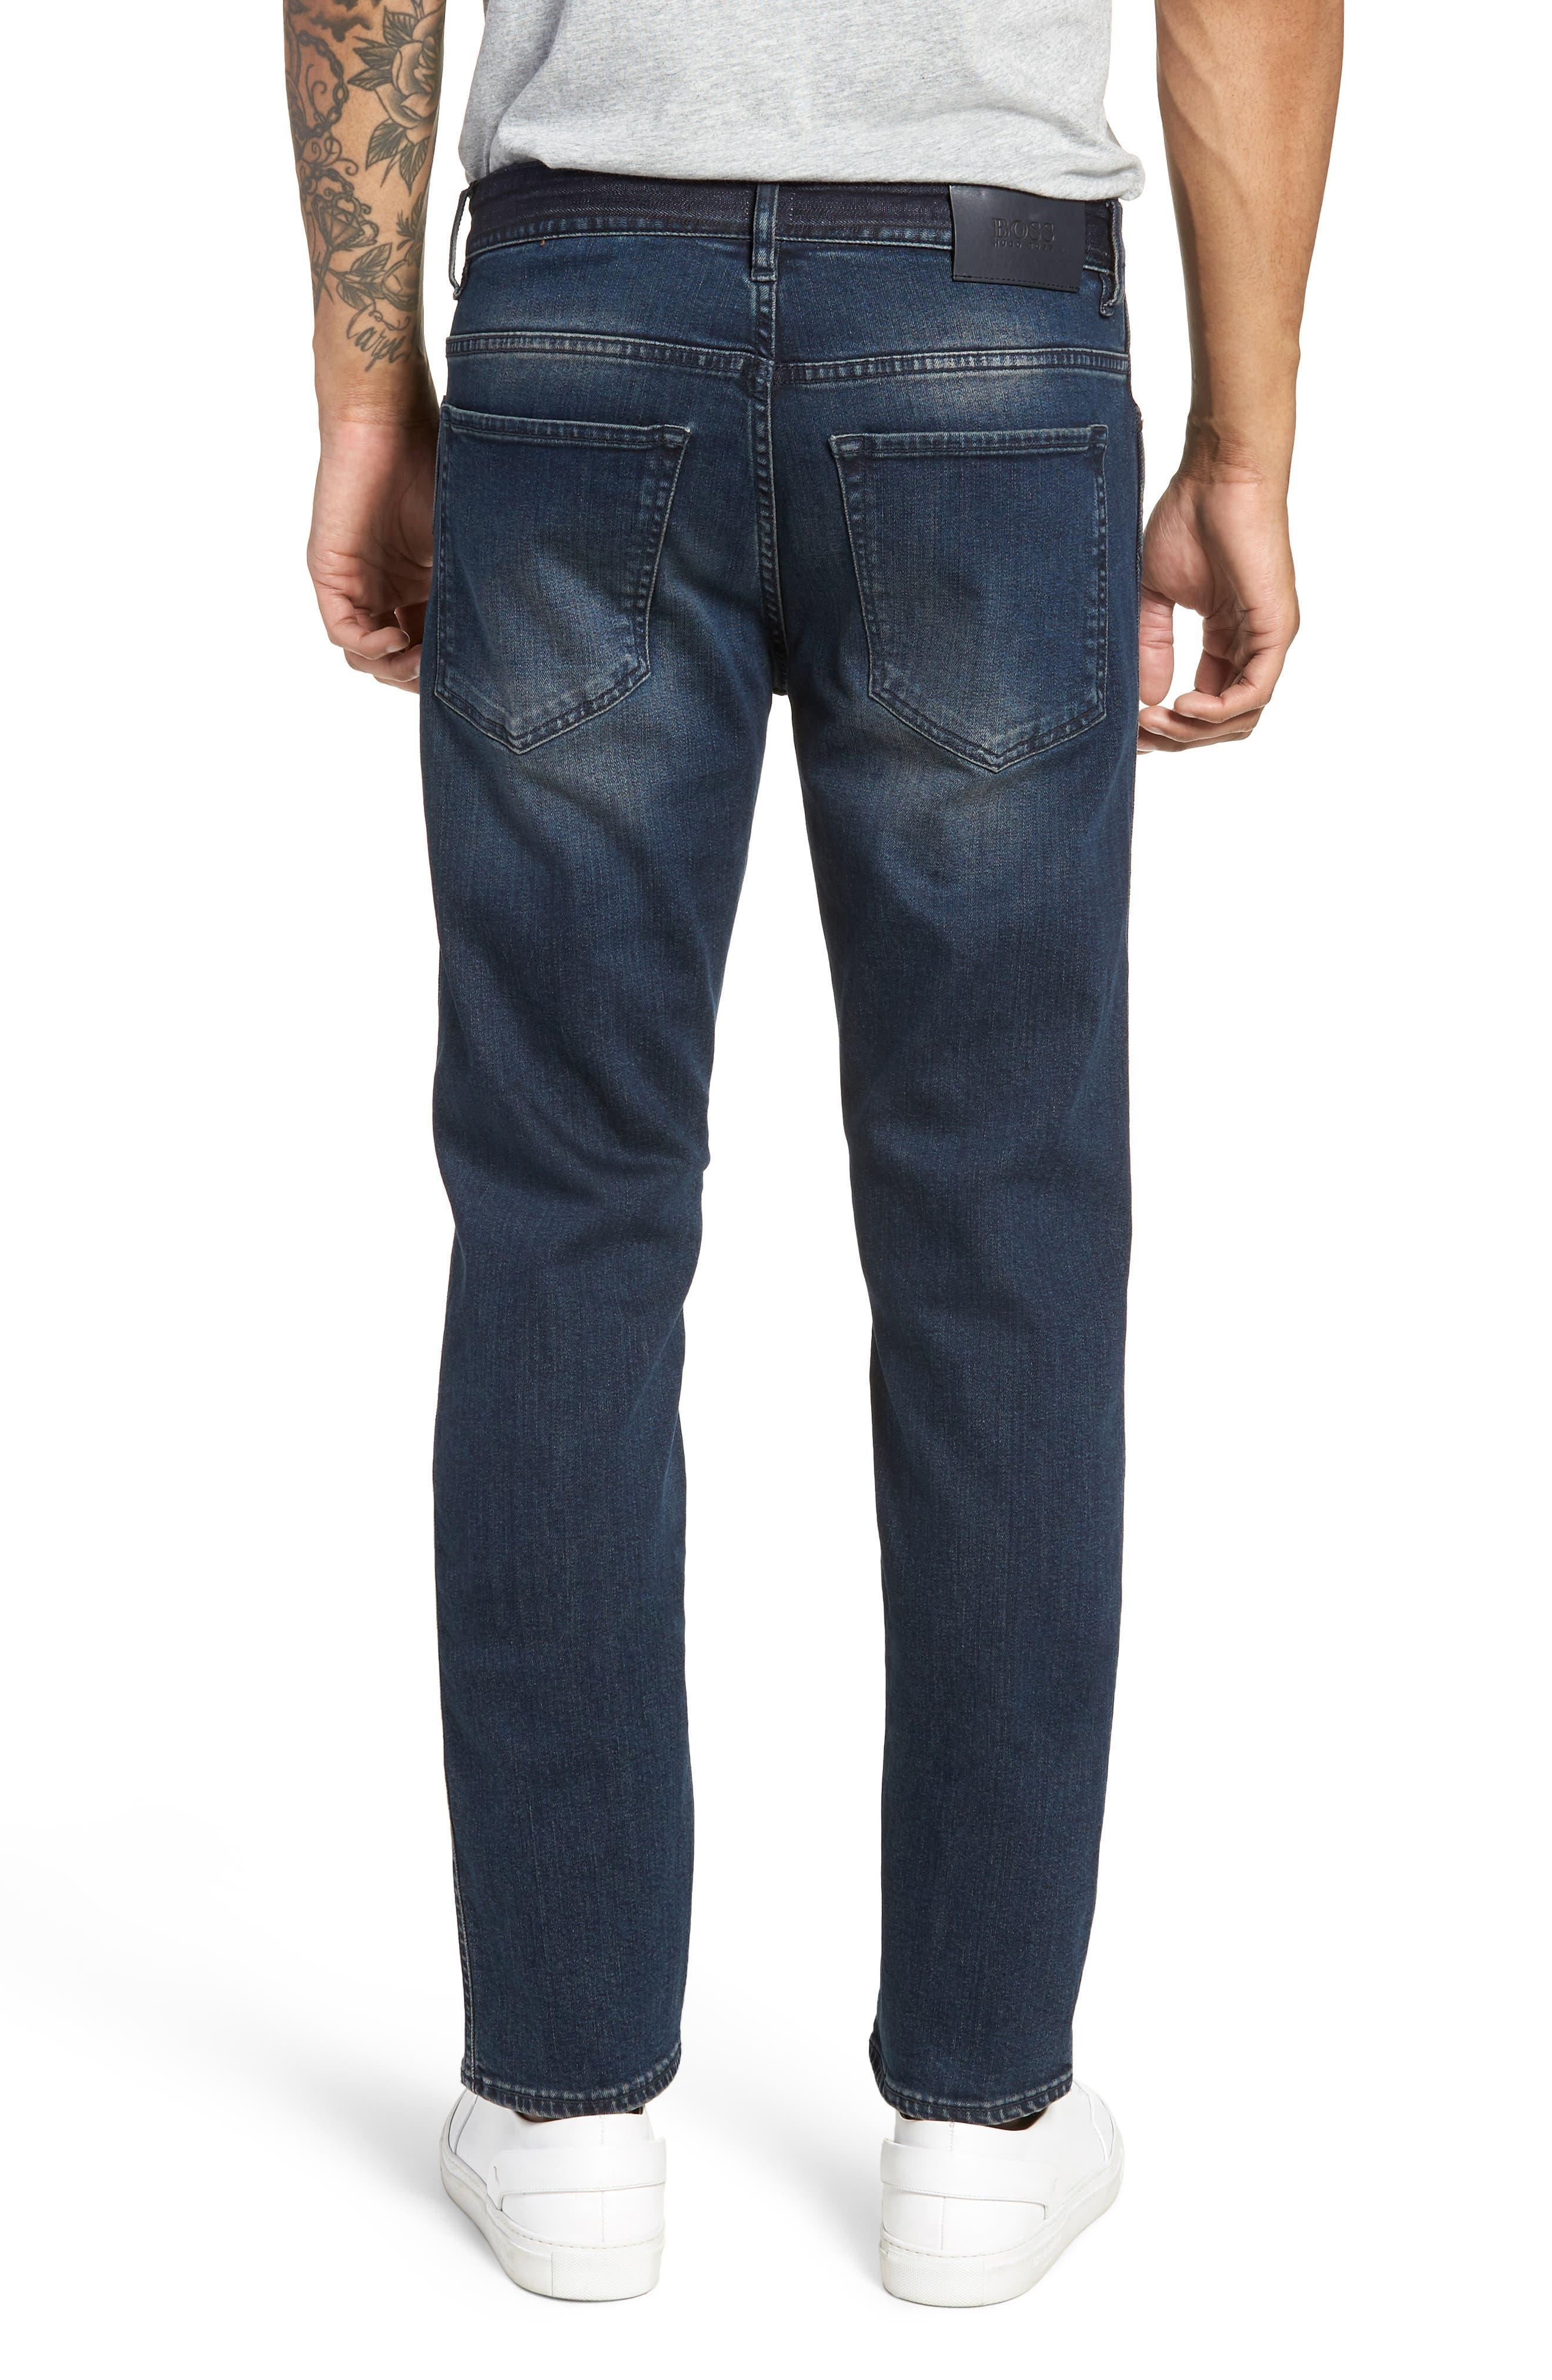 Delaware Slim Fit Jeans,                             Alternate thumbnail 2, color,                             418